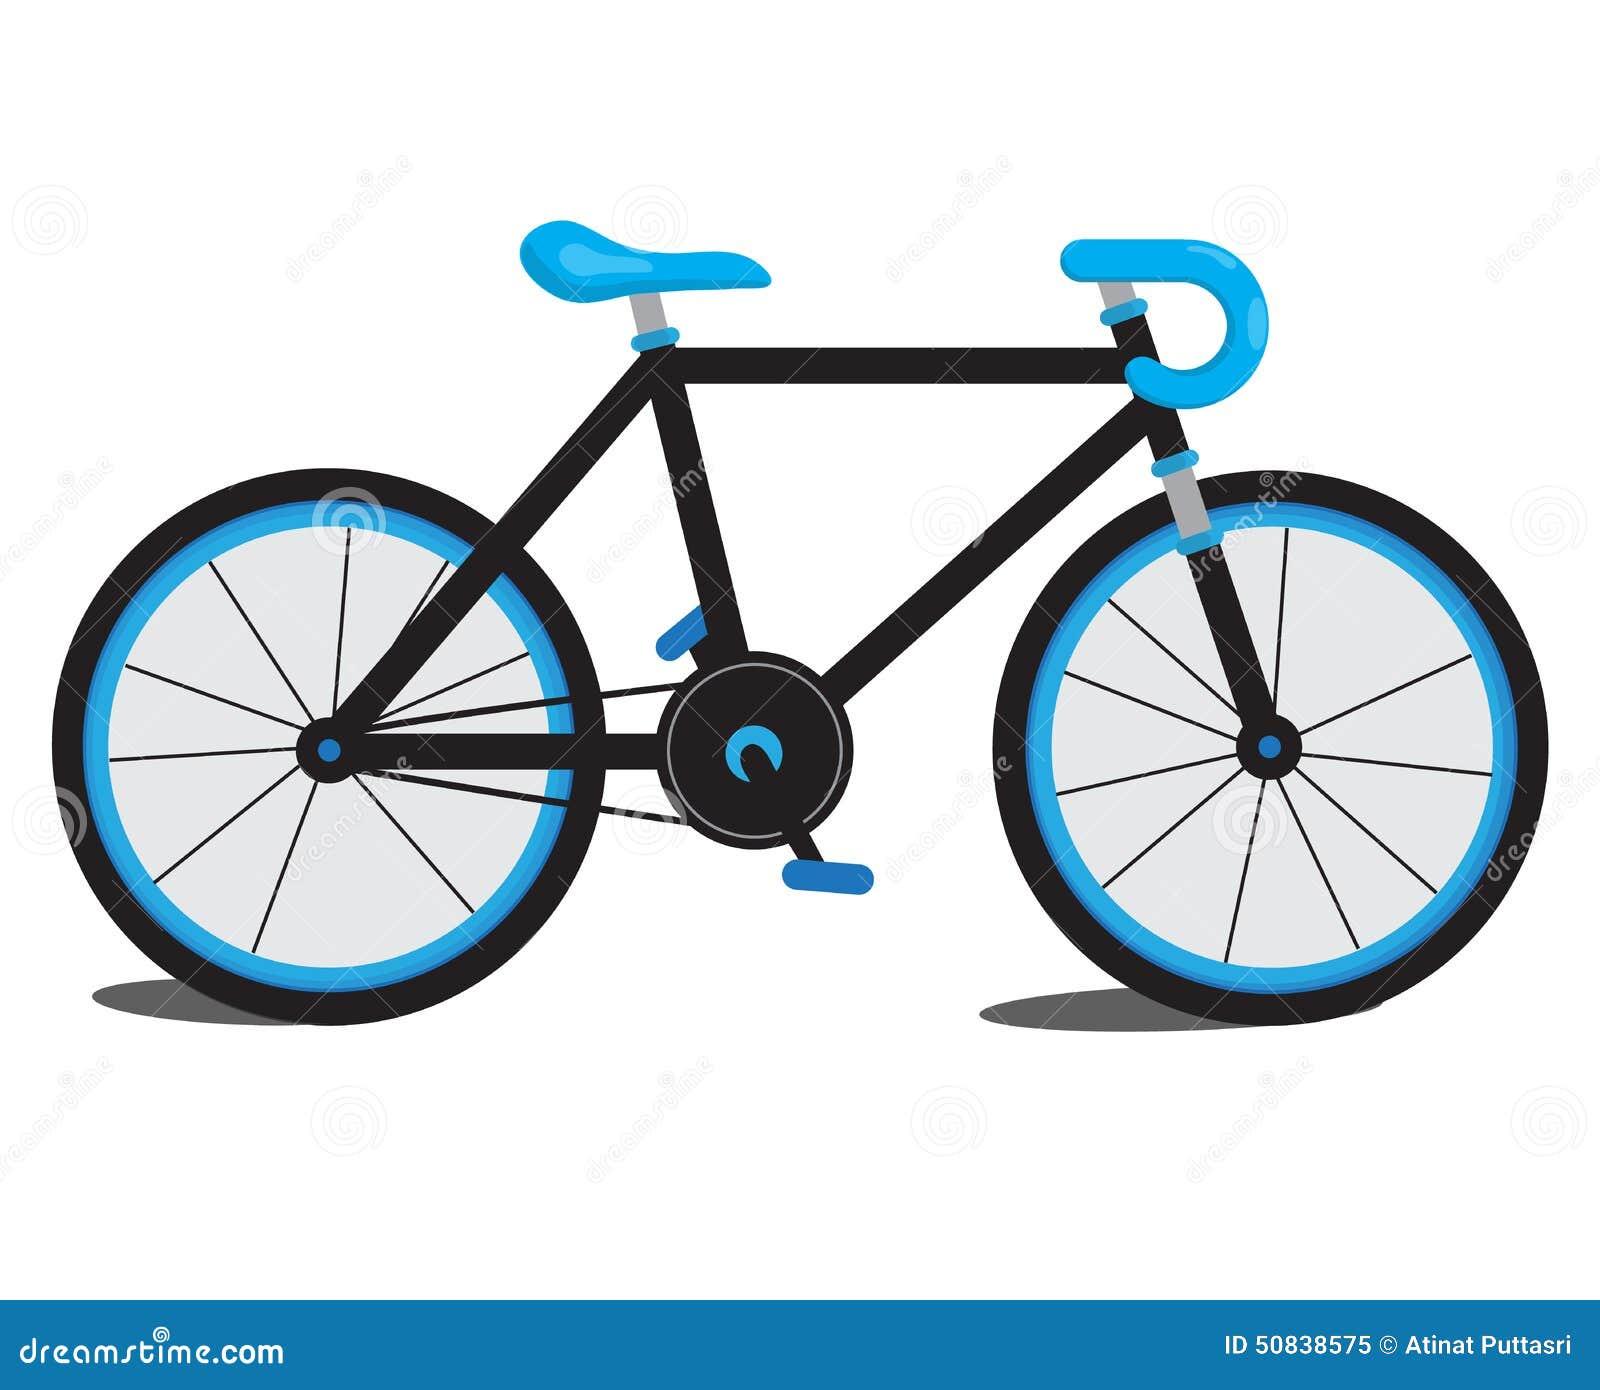 Bici azul ilustraci n del vector ilustraci n de deporte - La bici azul ...